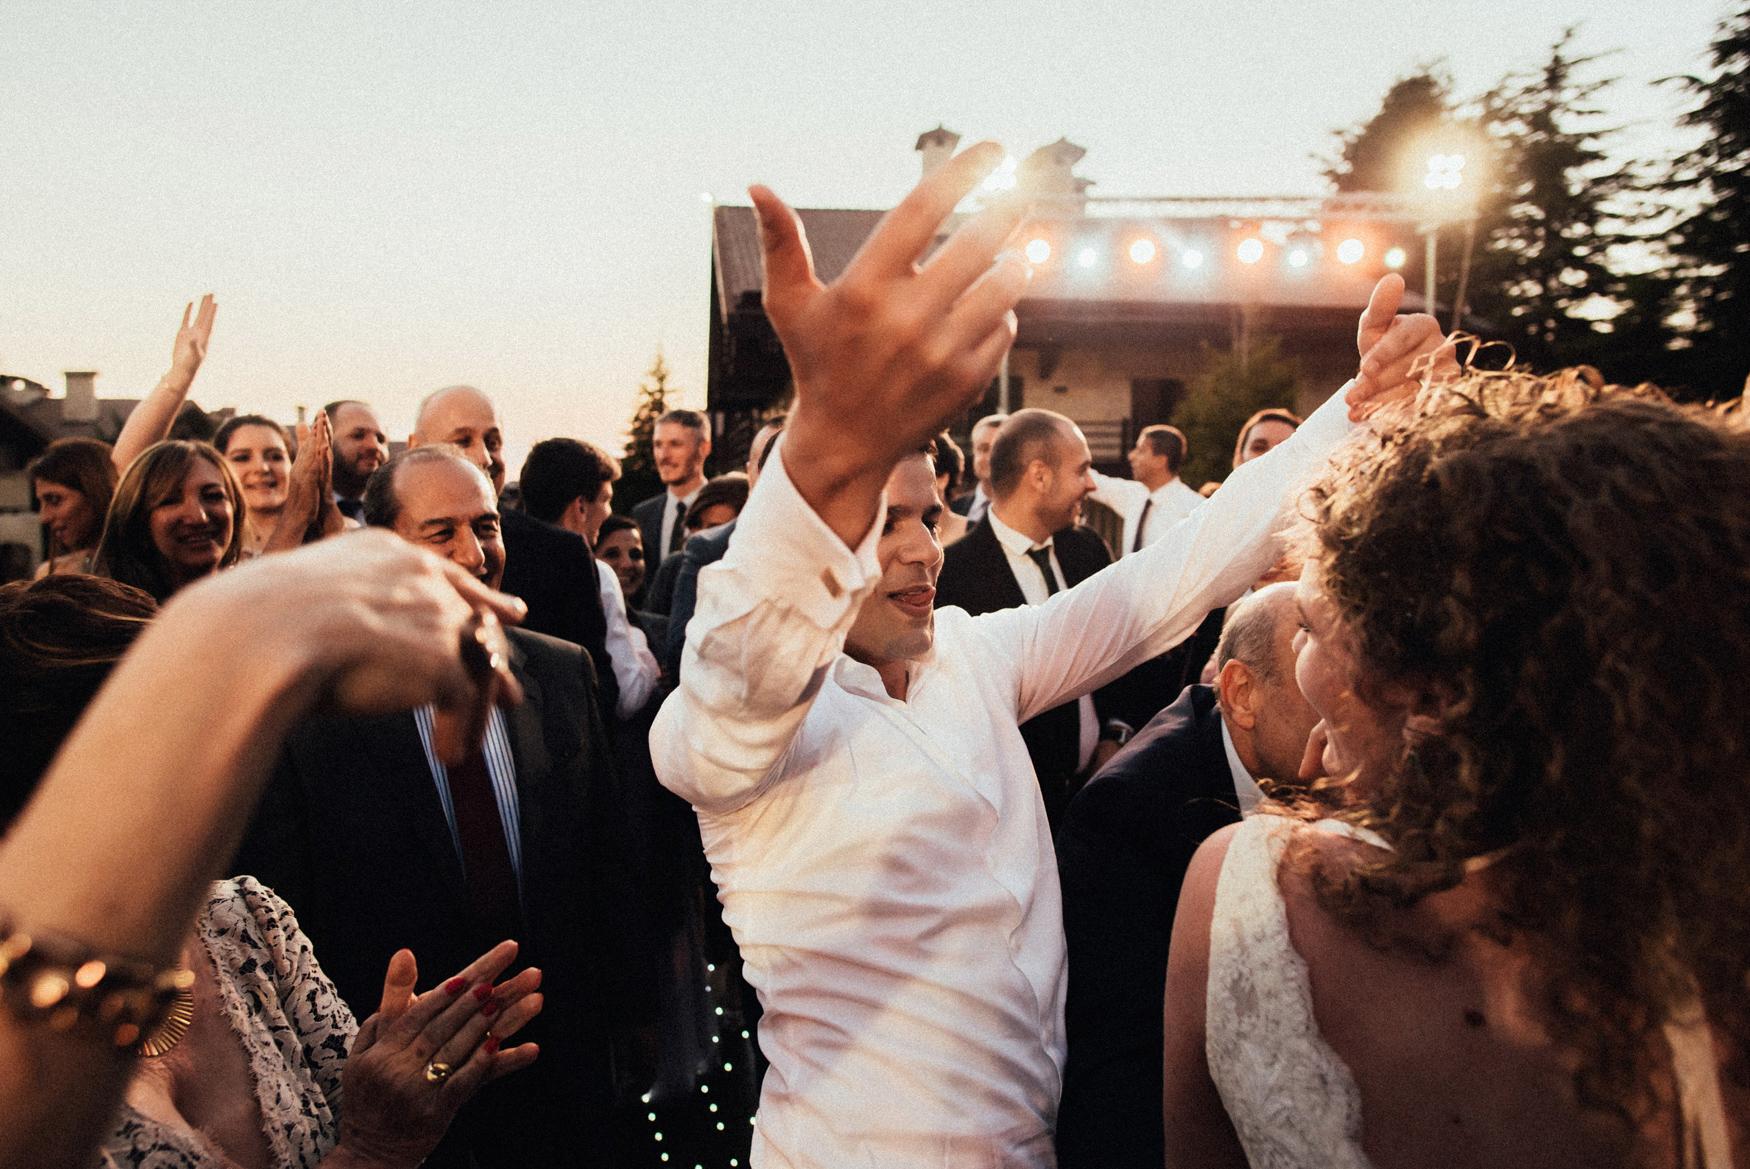 LR5 beirut lebanon mzaar intercontinental wedding photographer 028.jpg